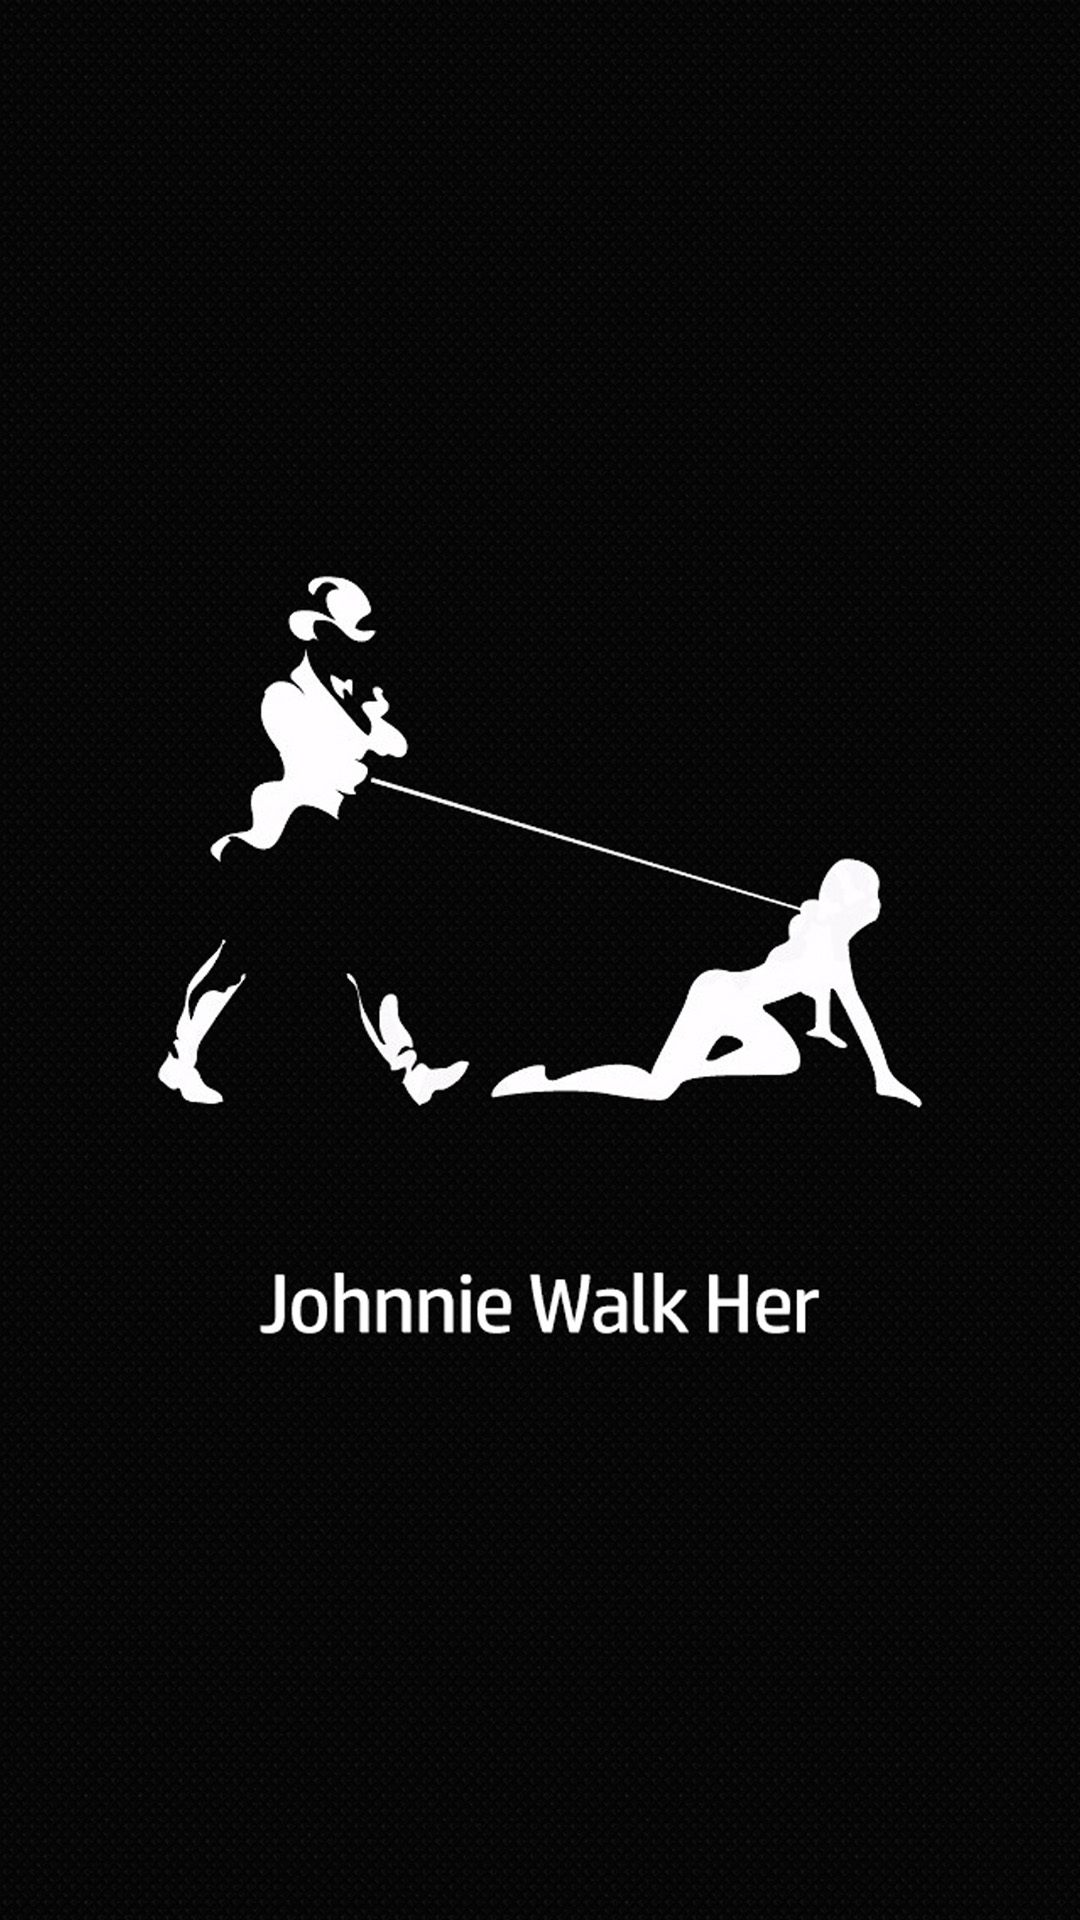 Funny Johnnie Walker HD Wallpaper IPhone 6 Plus Wallpapersmobilenet 1080x1920